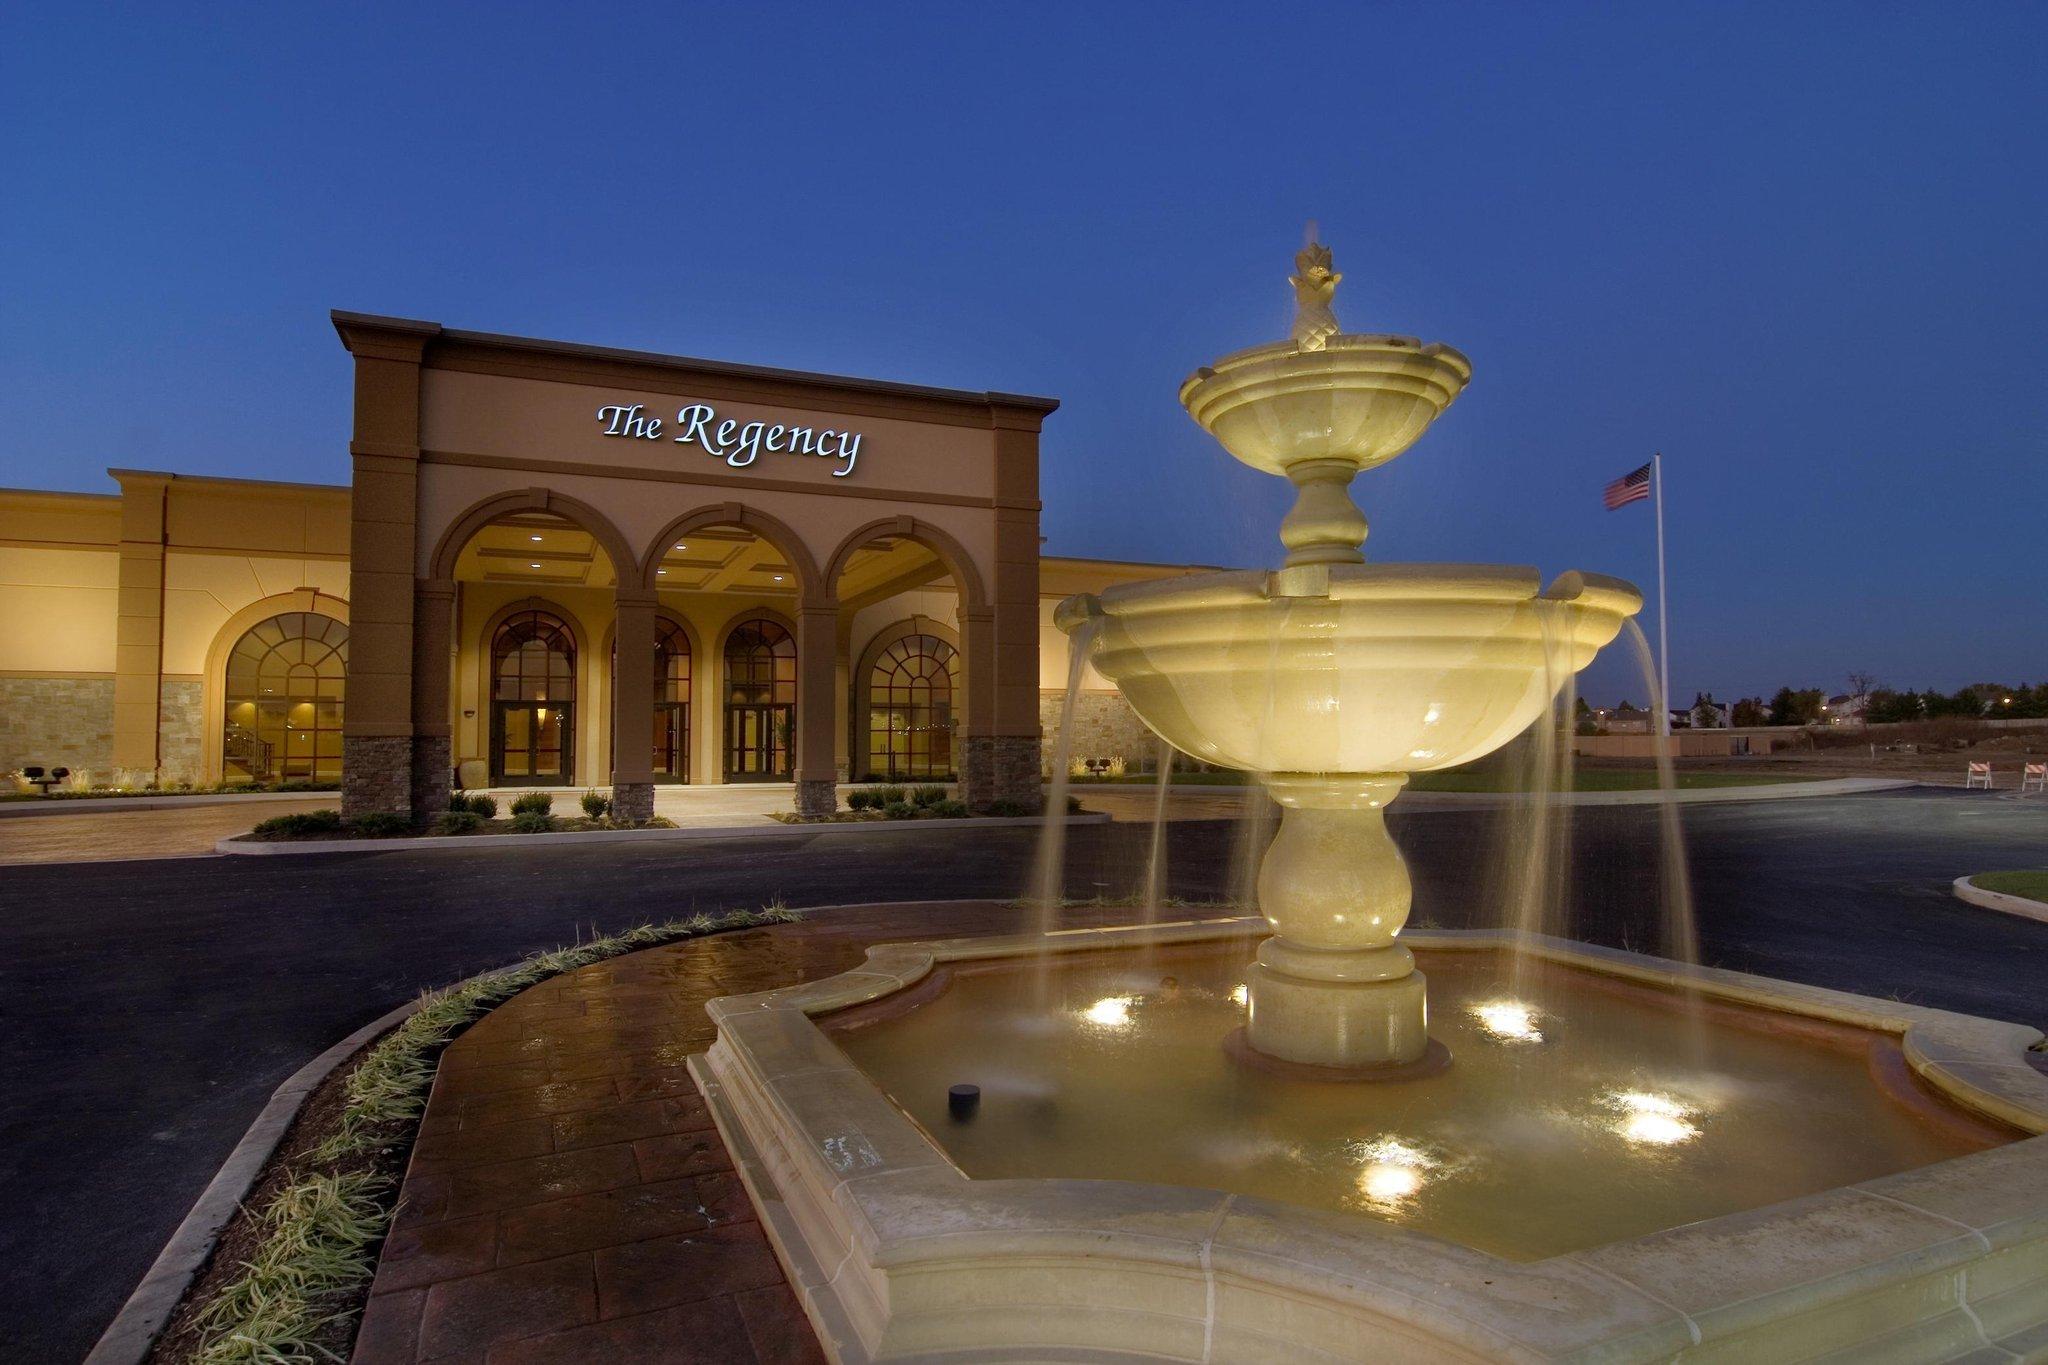 Hilton Garden Inn & The Regency Conference Center | Enjoy Illinois